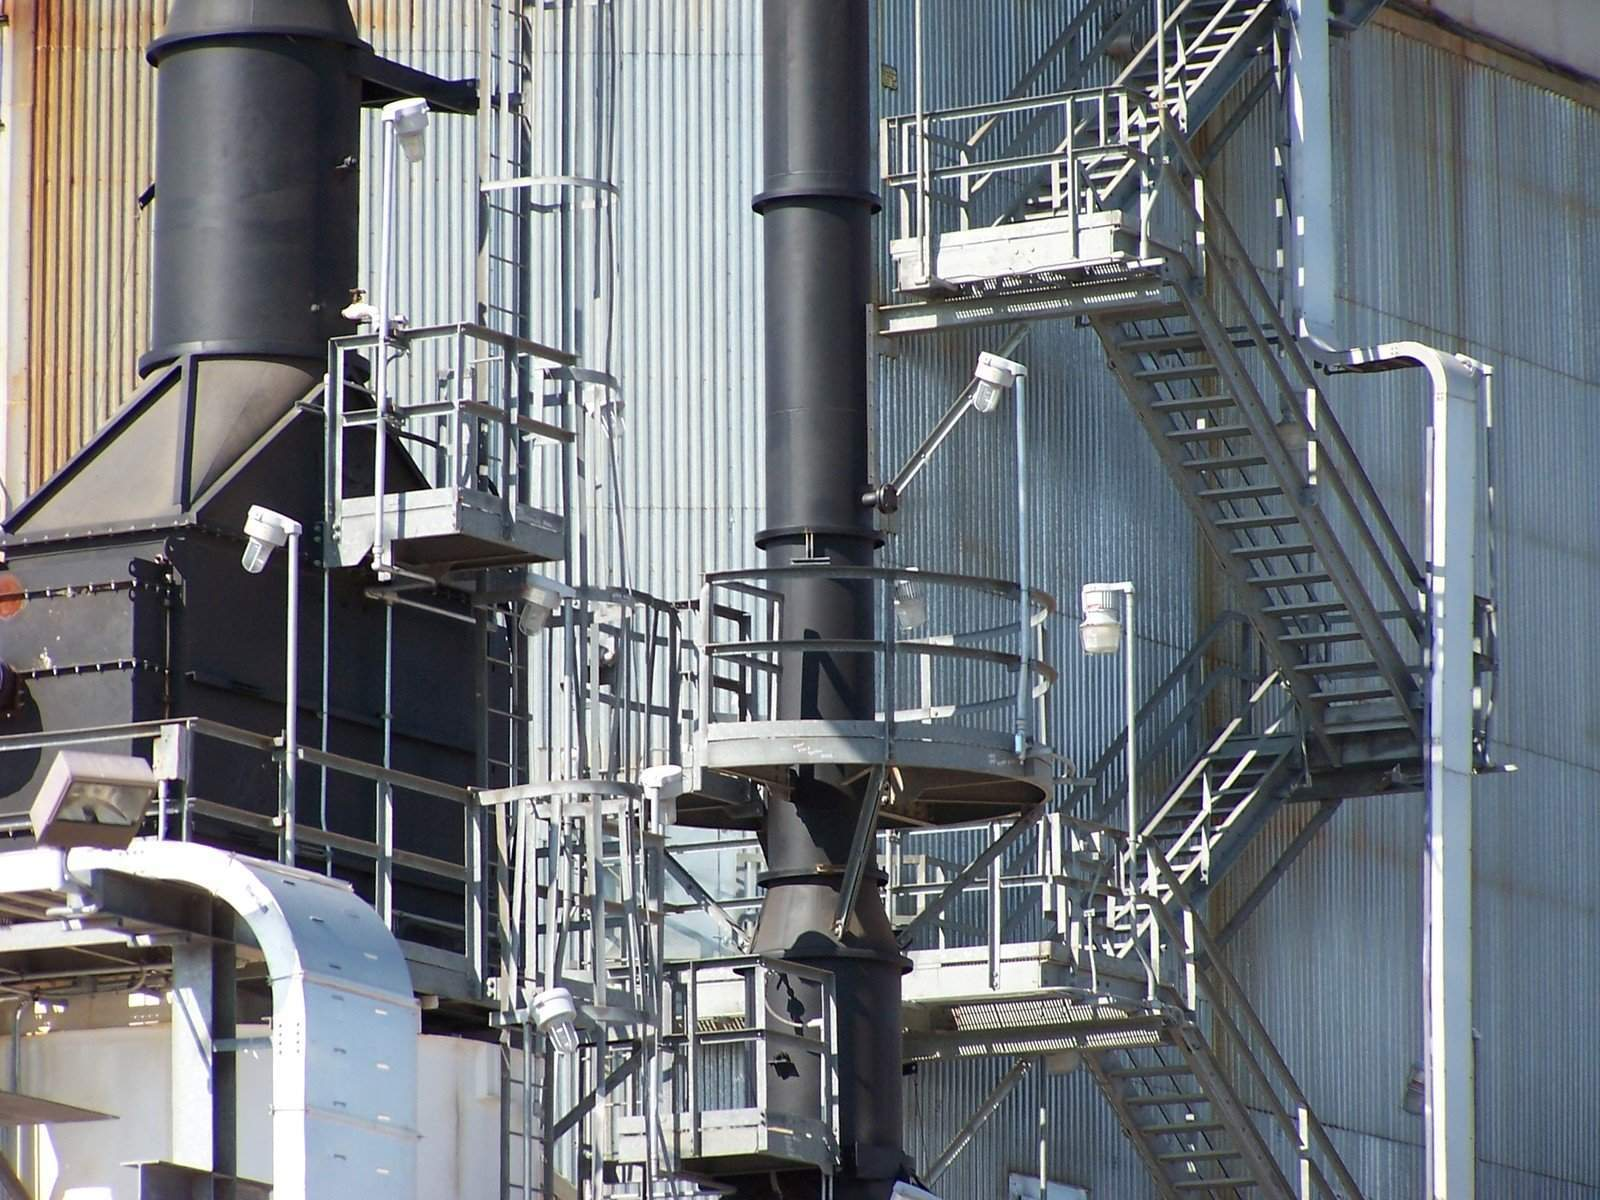 refinery-row-1545672